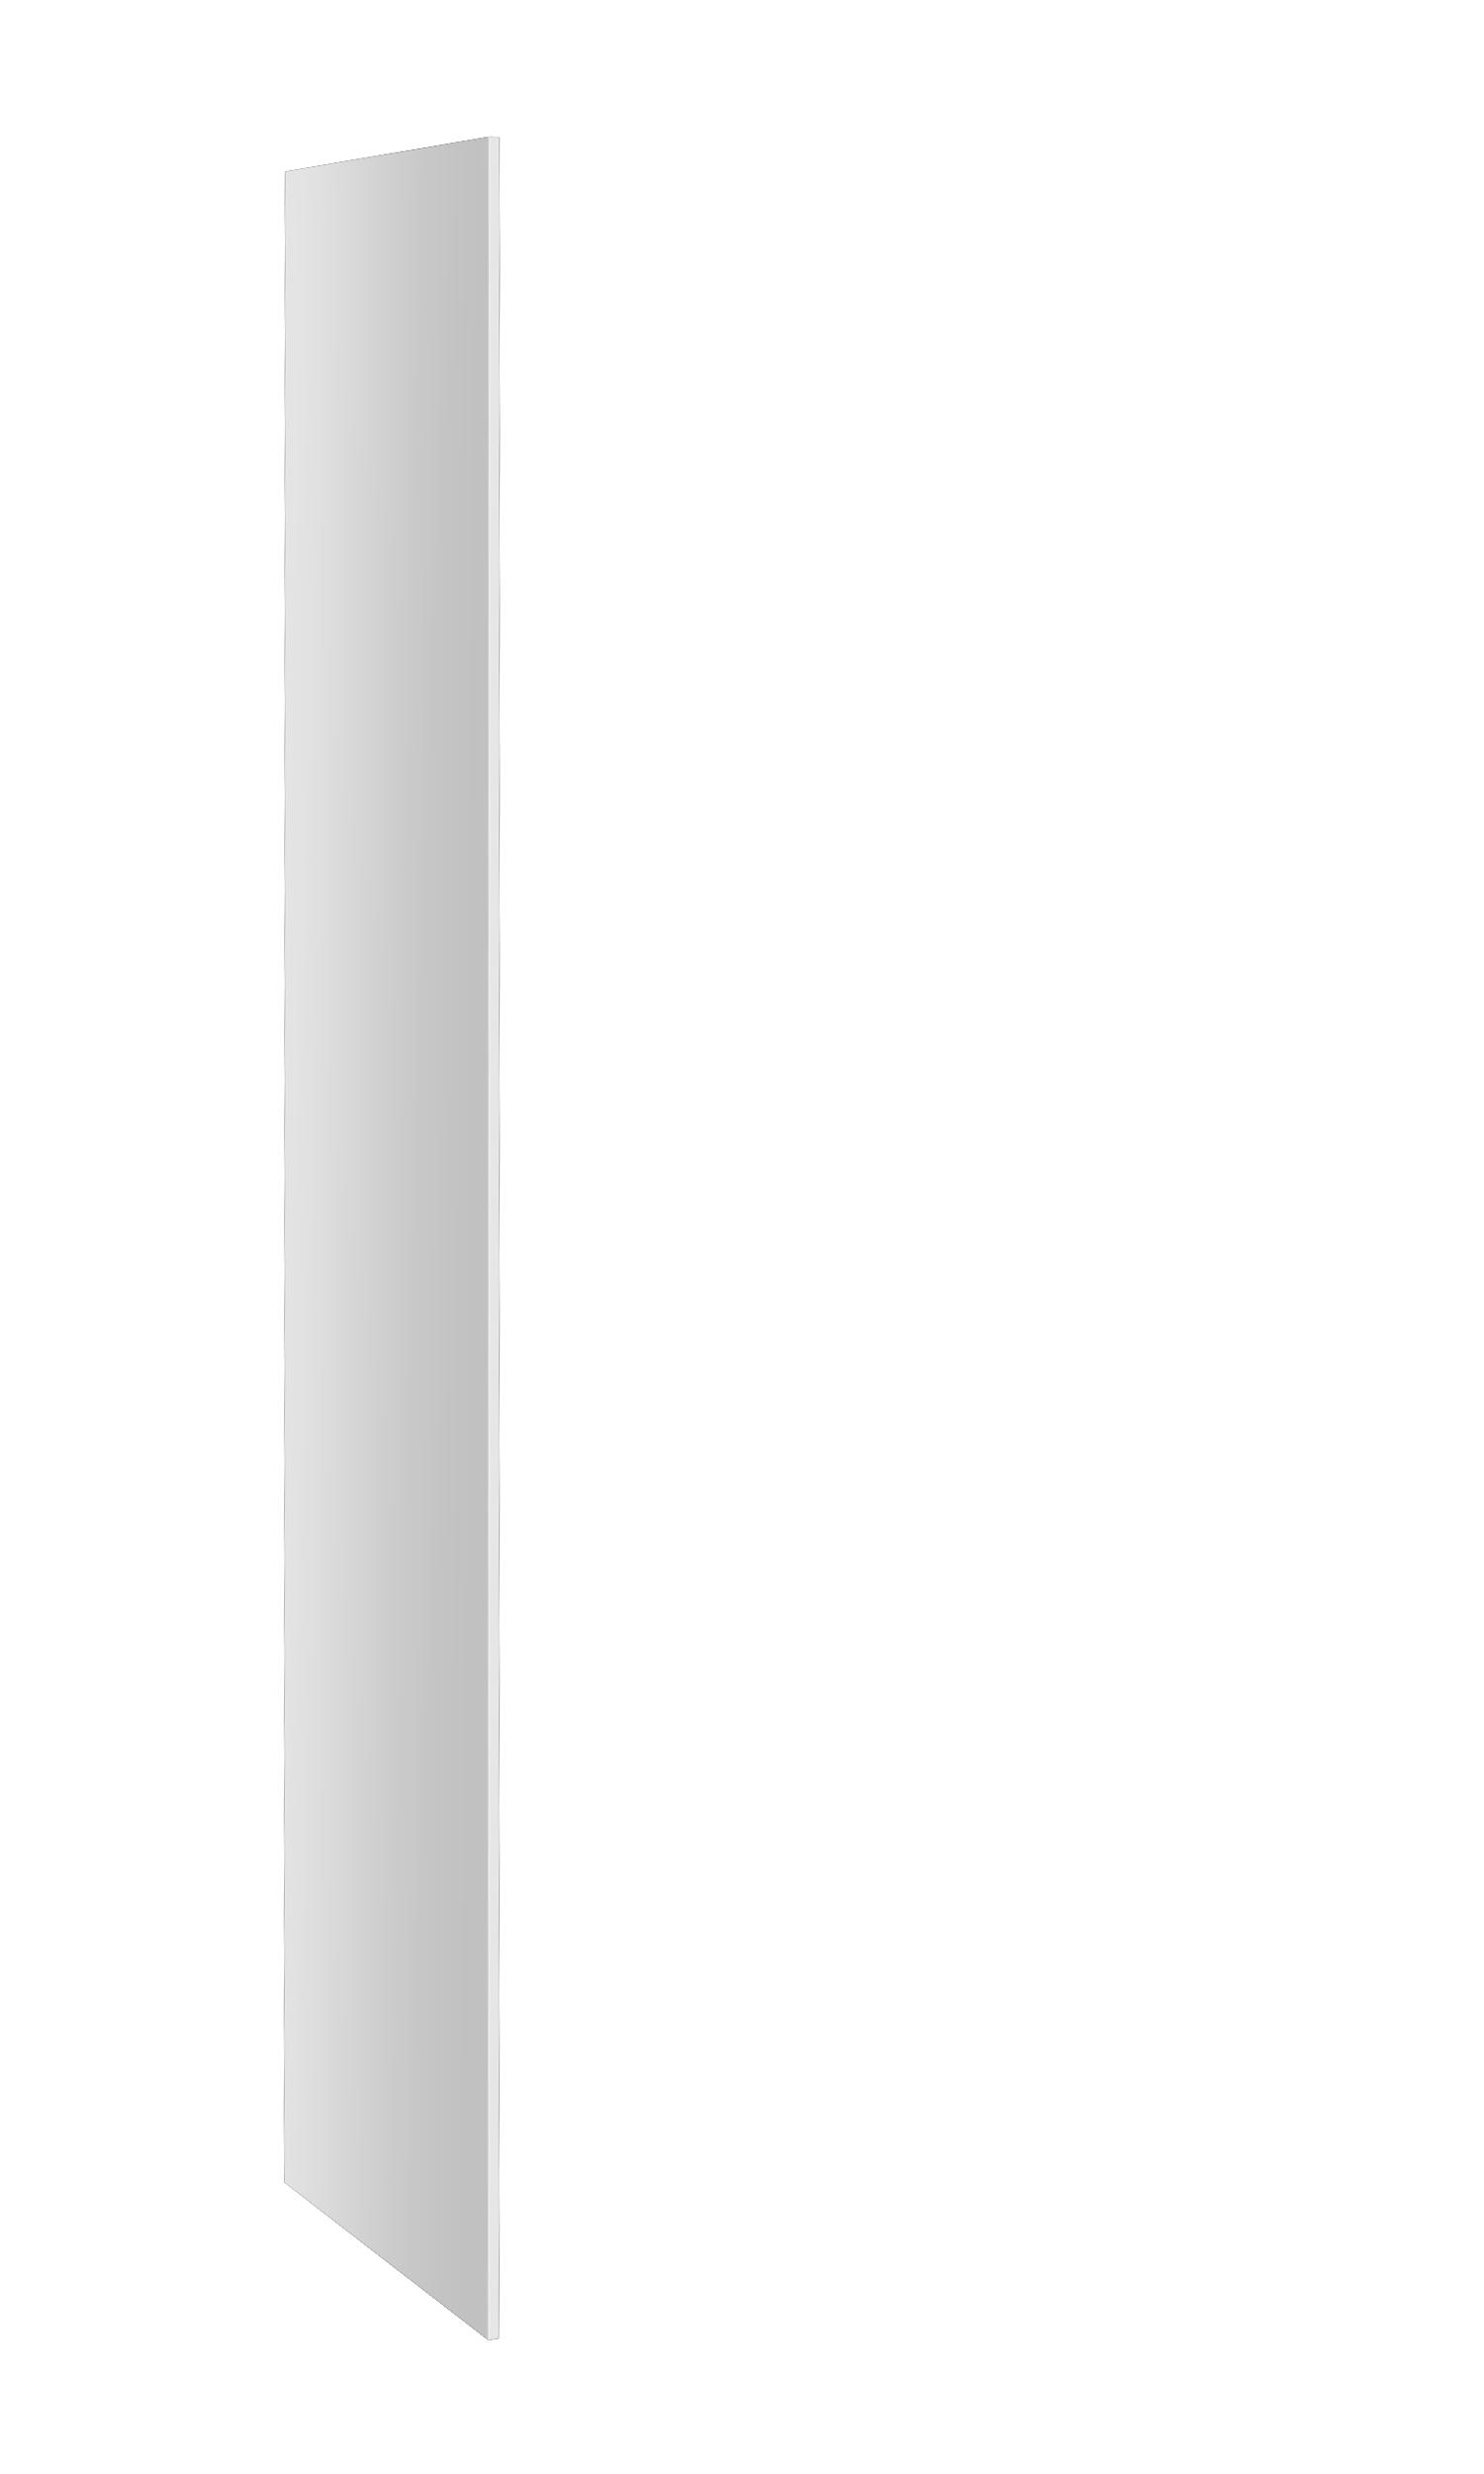 Probe buzzbox laminate end panel white